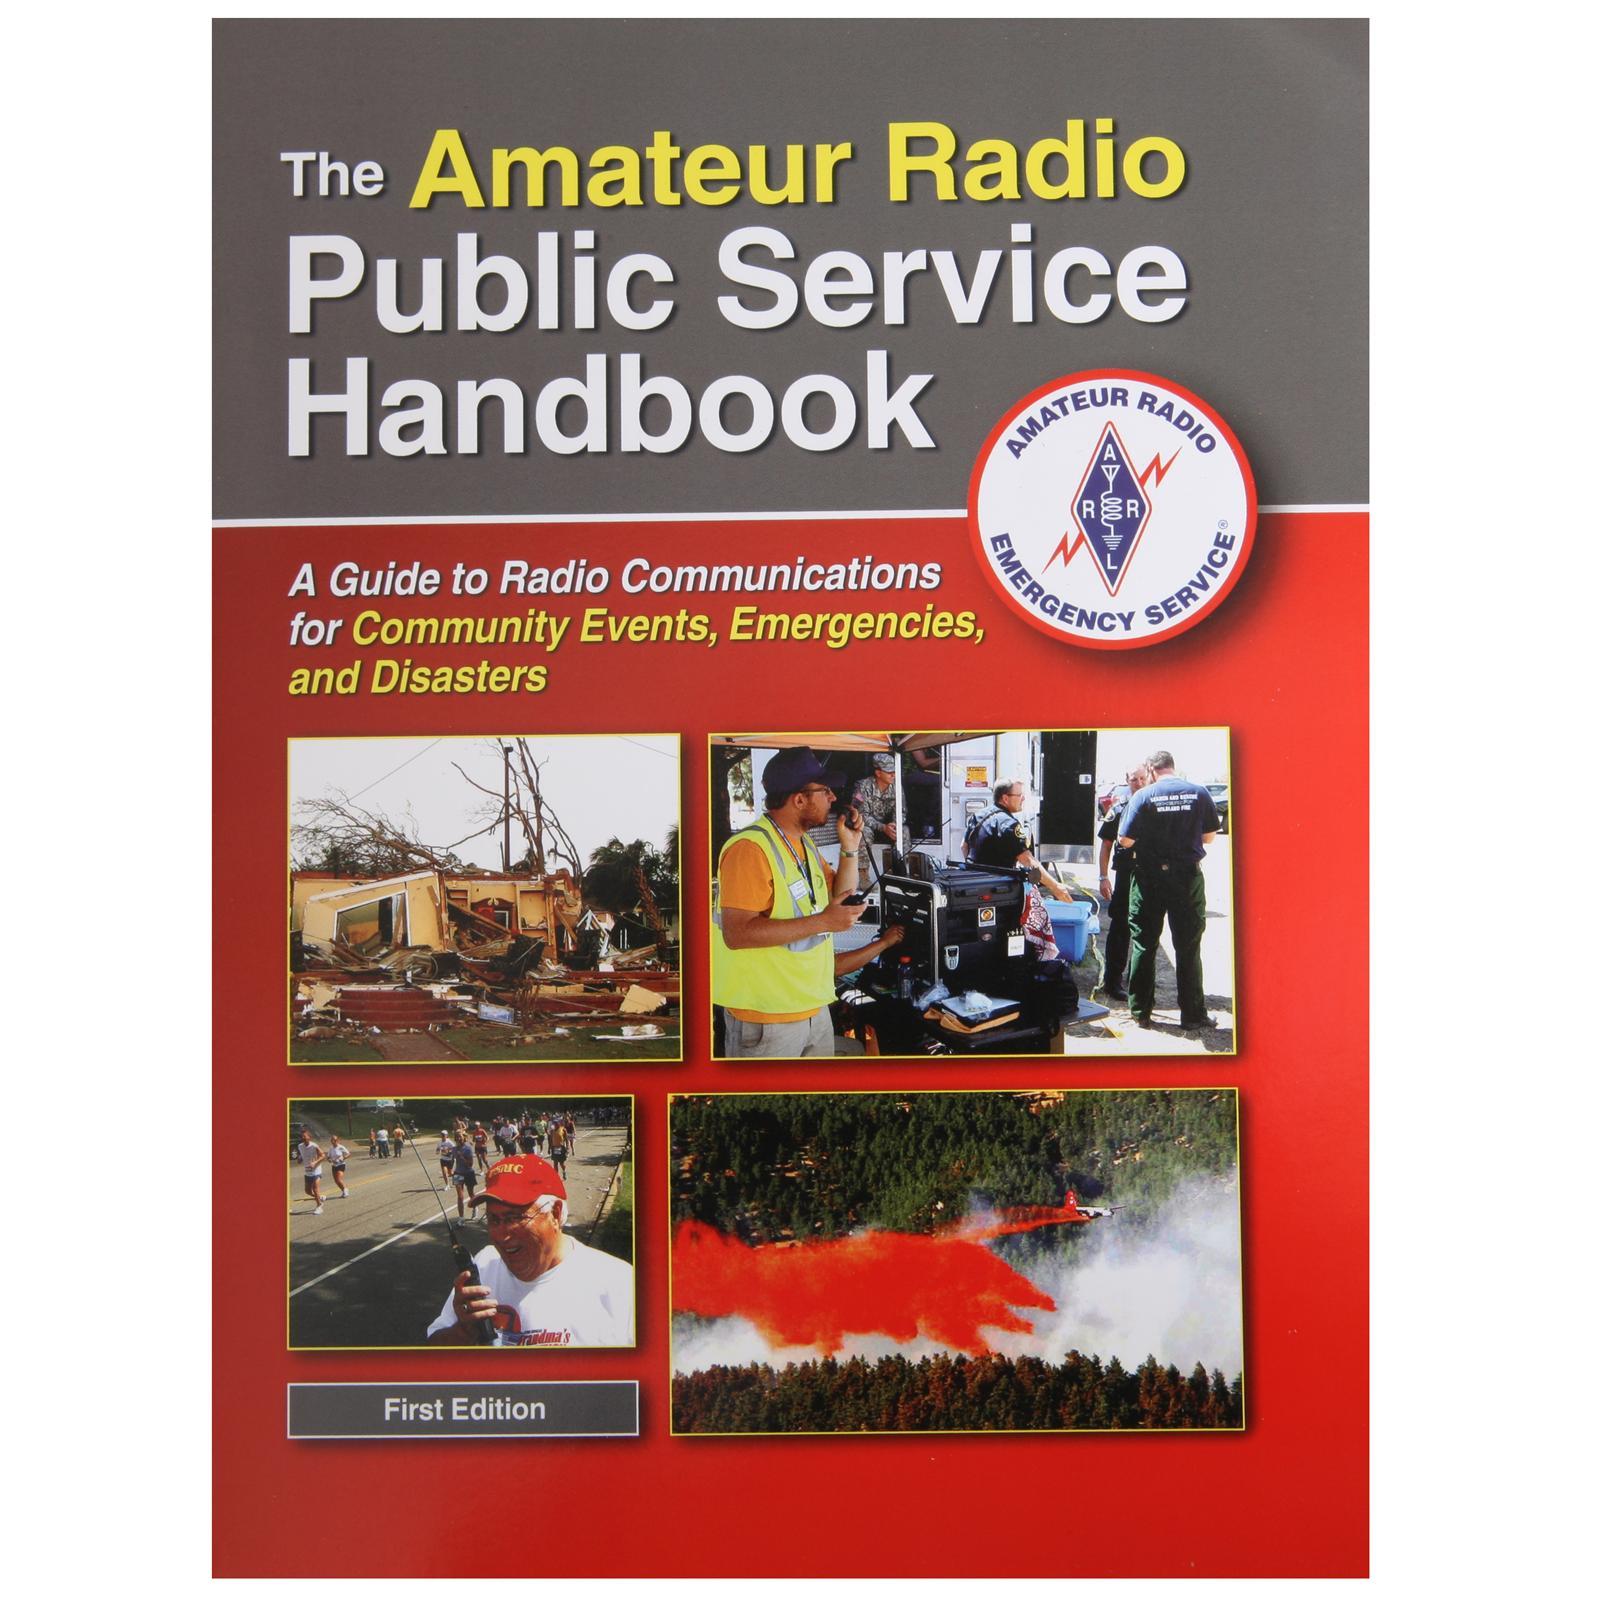 ARRL - The Amateur Radio Public Service Handbook 4845 - Free